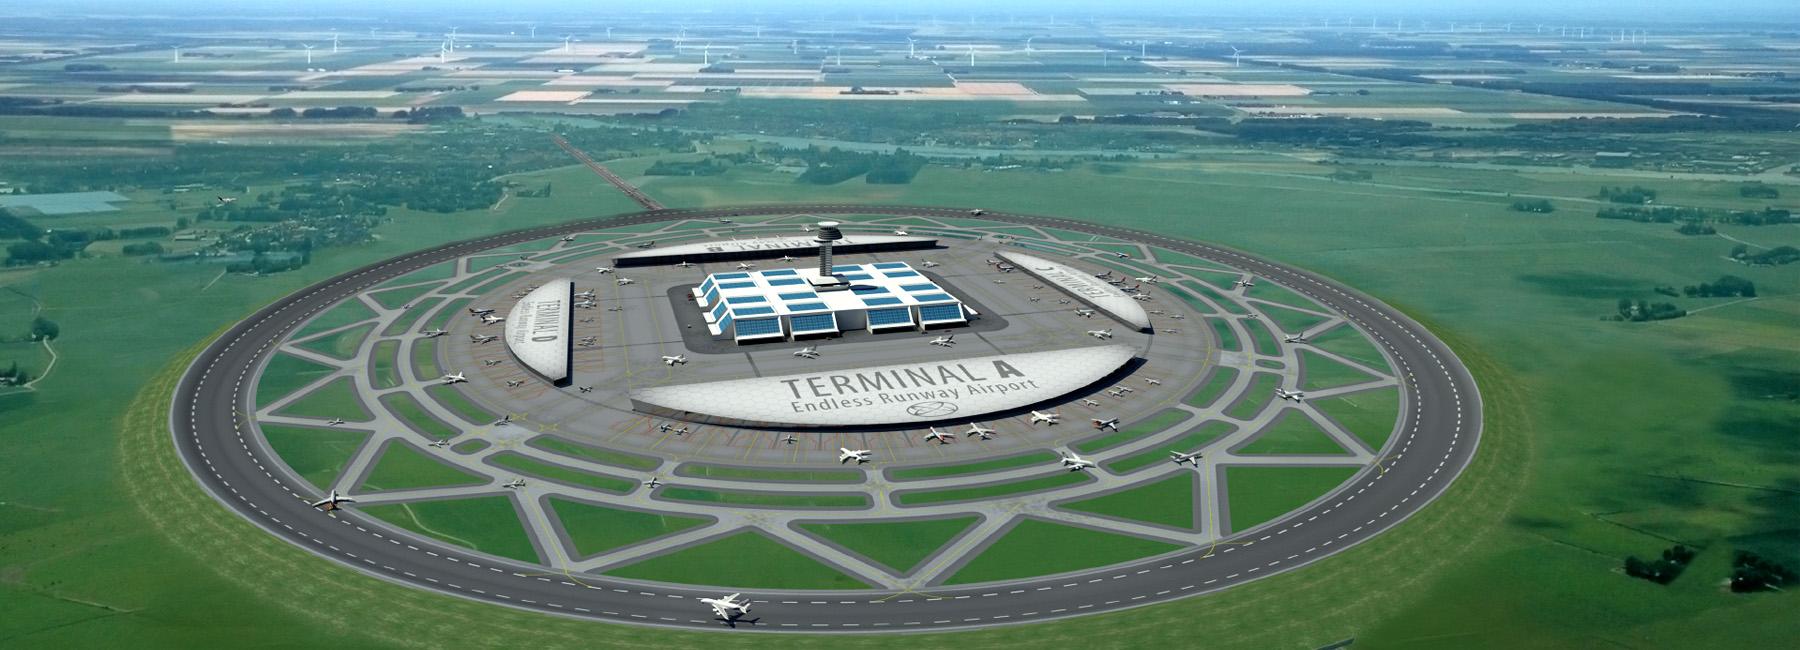 the-endless-runway-concept-designboom-03-23-2017-fullheader.jpg